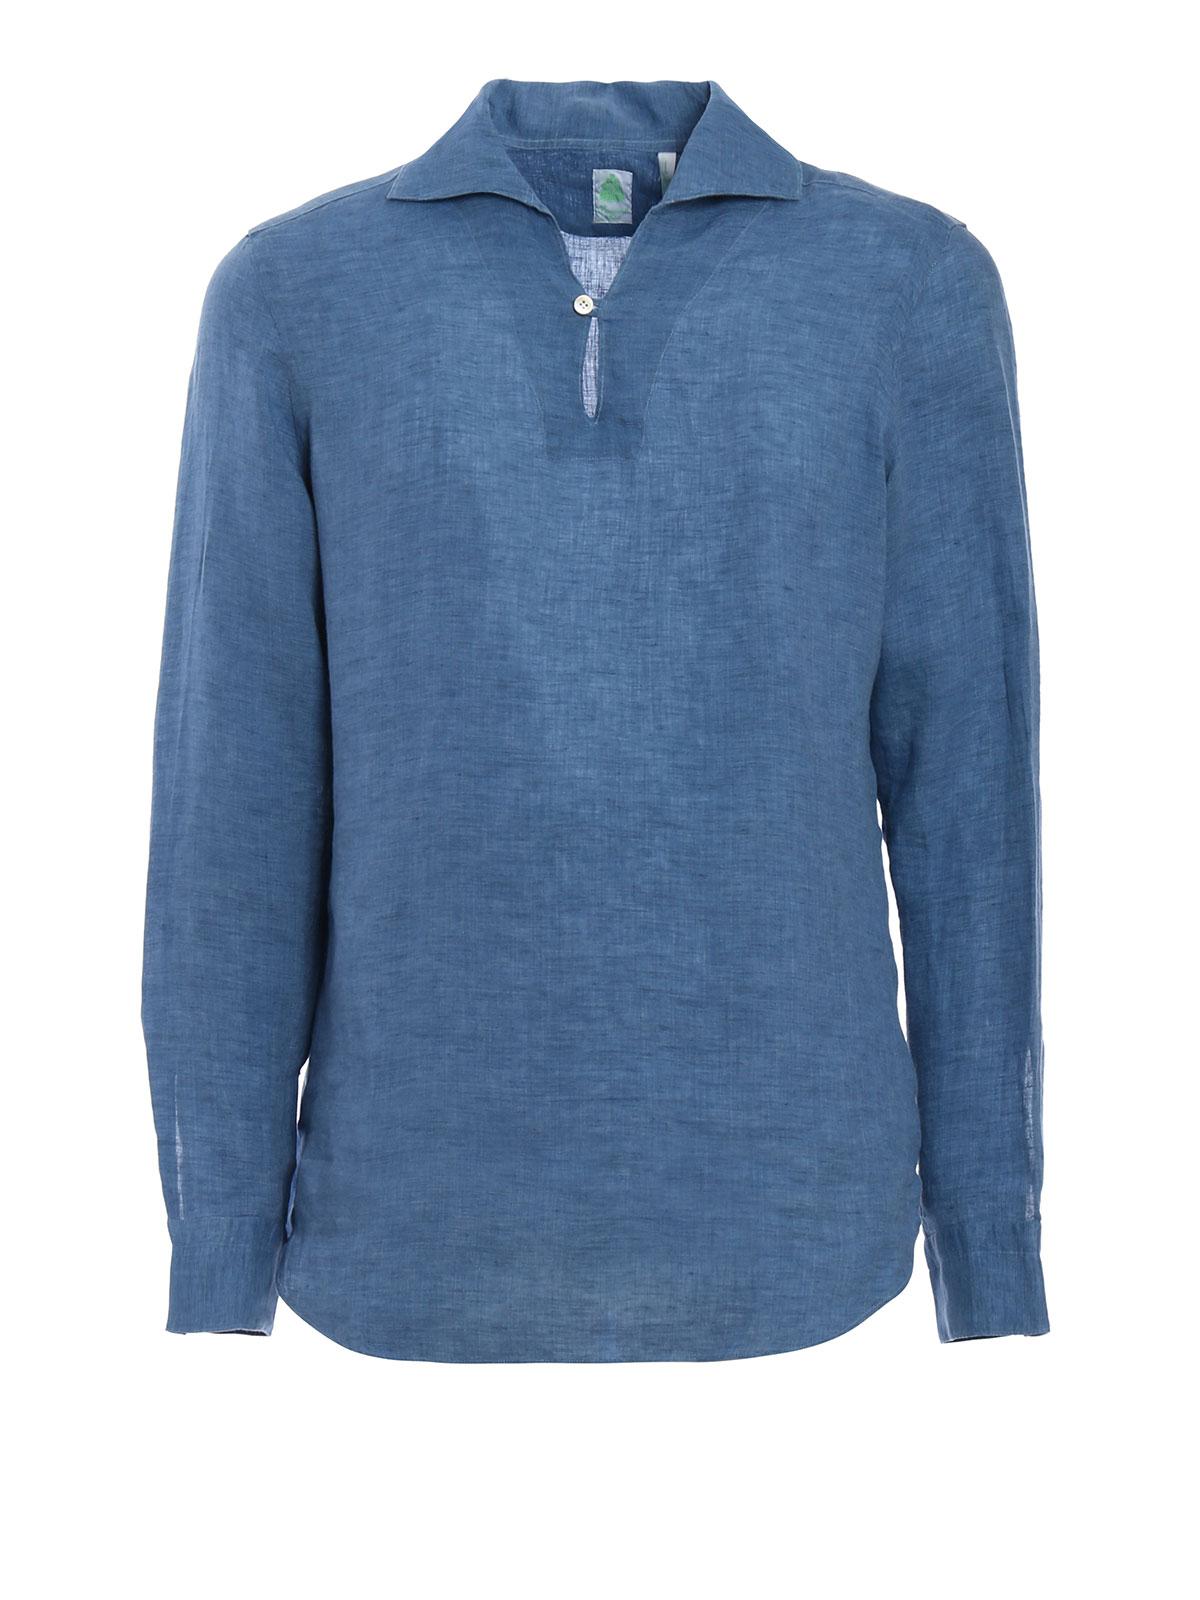 c4b0dc9b6b Finamore 1925 - Minorca linen shirt - shirts - MINORCAA01060876